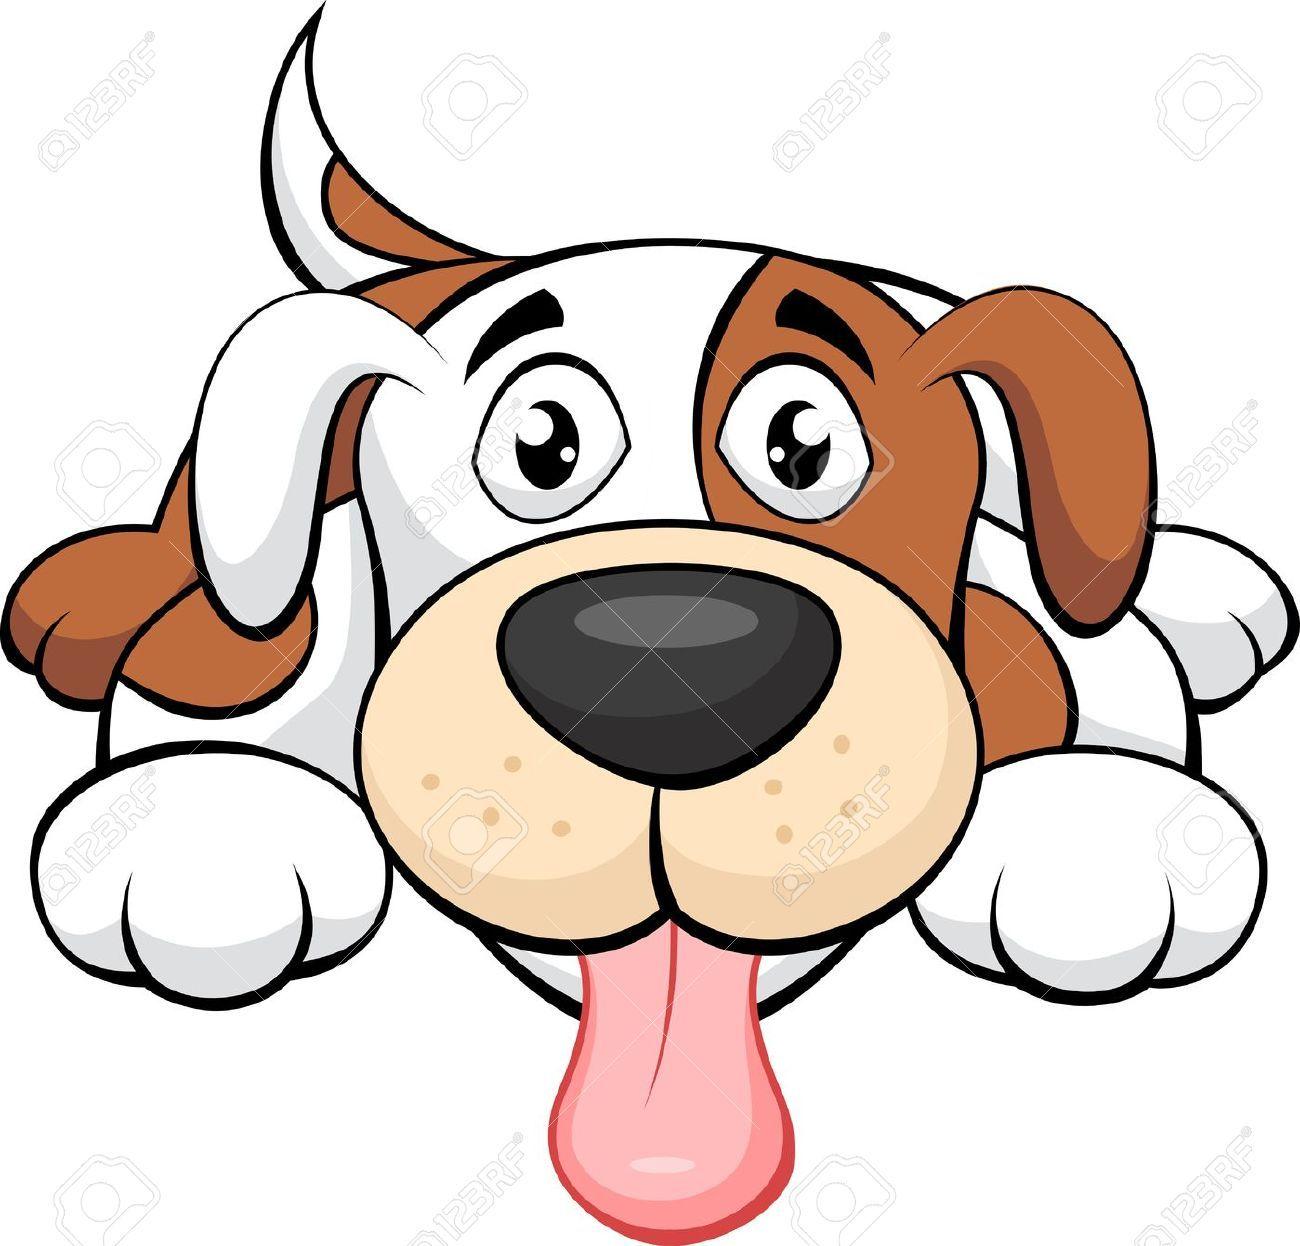 Cute Cartoon Dogs Clip Art Cartoon Dog Animai Images Dog Cartoon